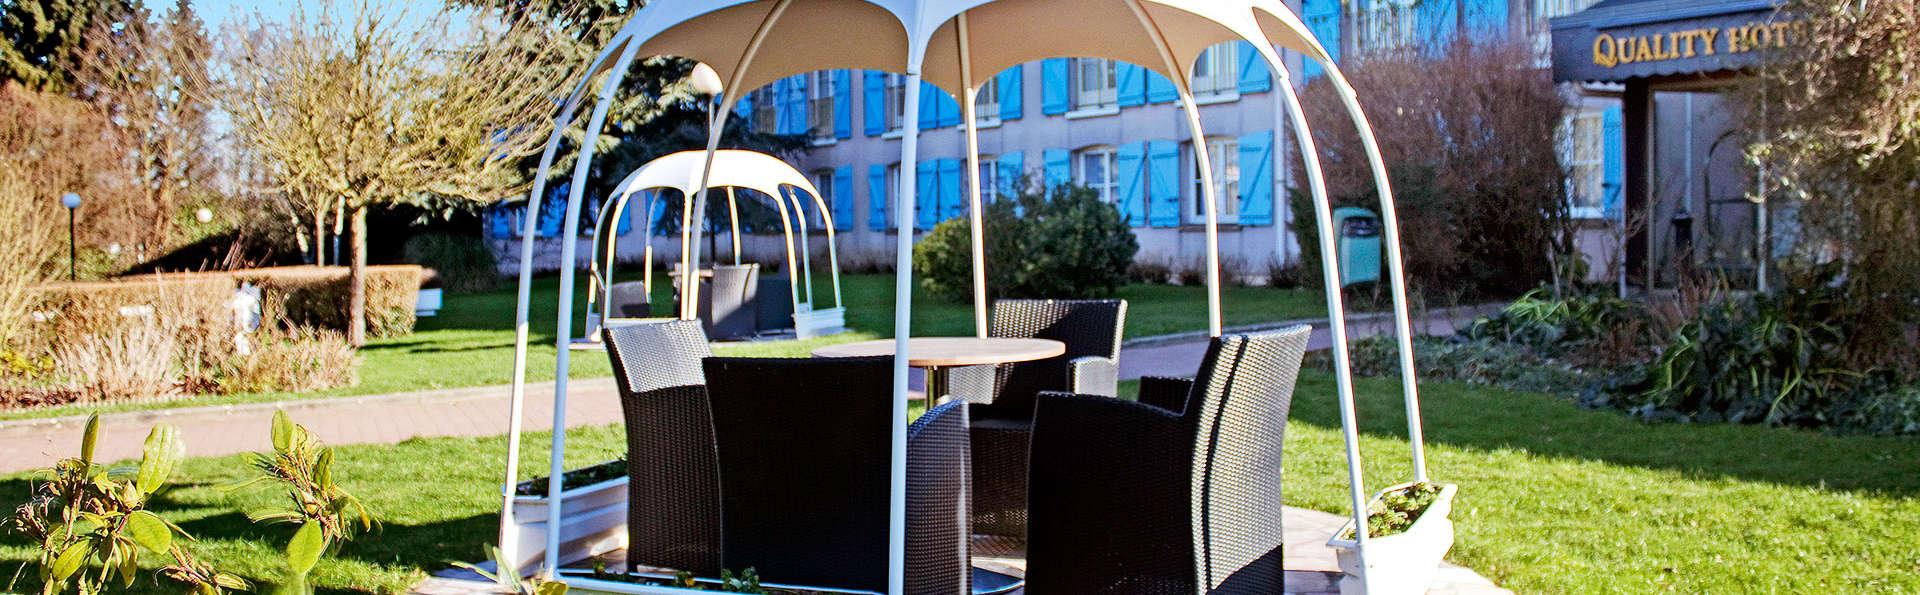 Qualys Hotel La Bertelire htel de charme SaintMartinduVivier